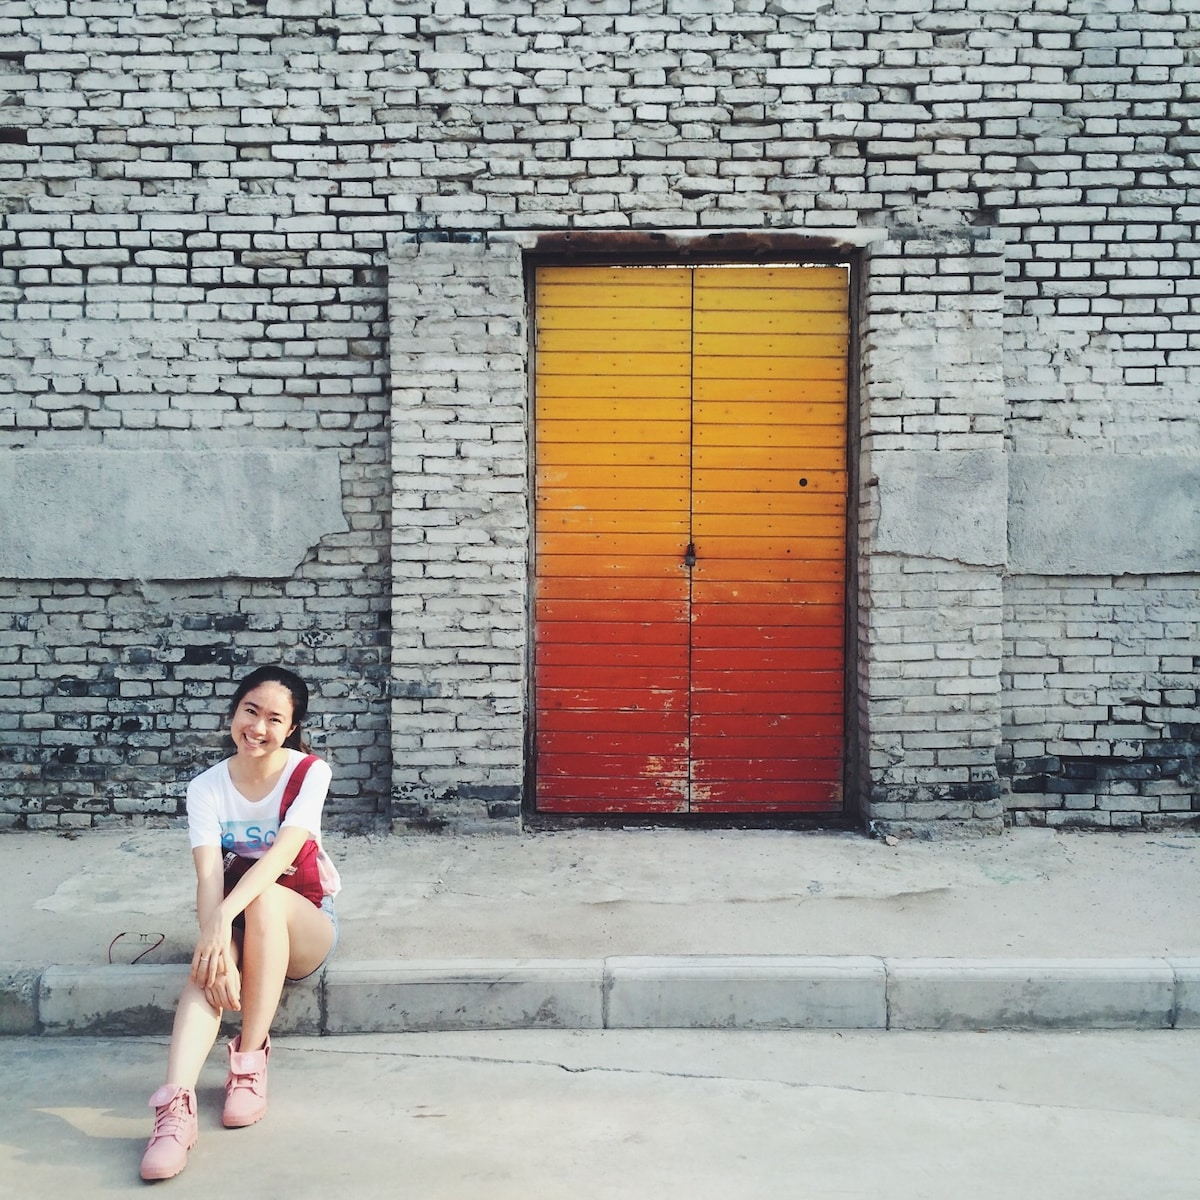 Sunny From Xi'an, China